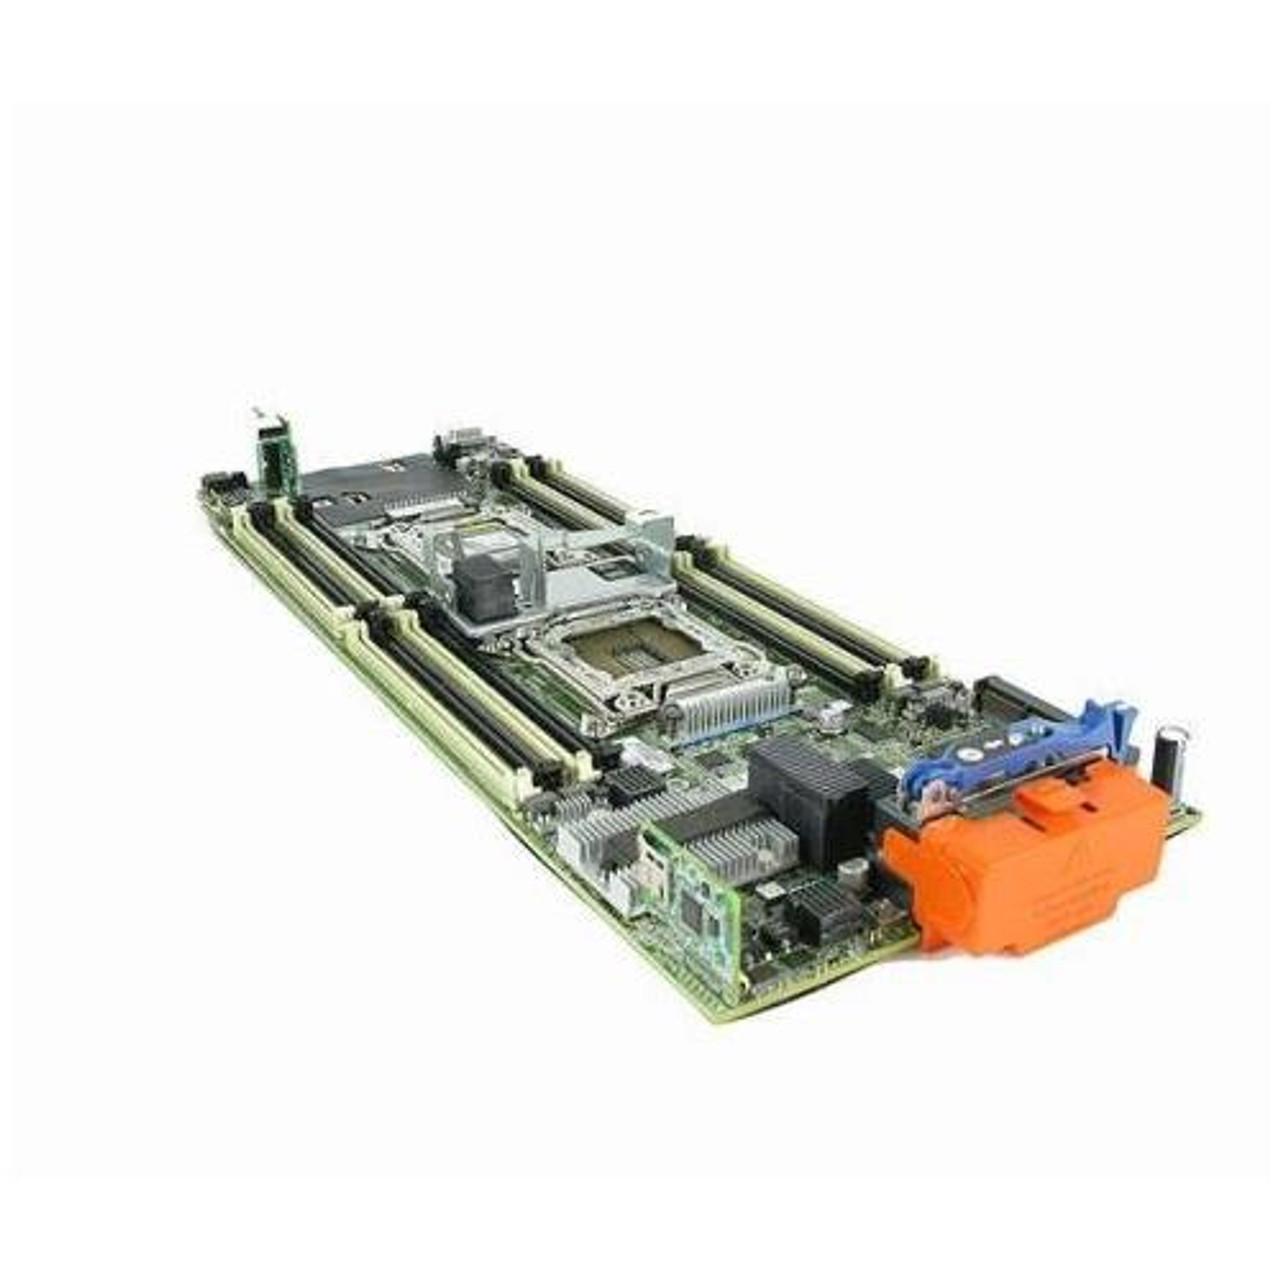 HP 692906-001 Proliant BL460c G8 Blade Server System MotherBoard